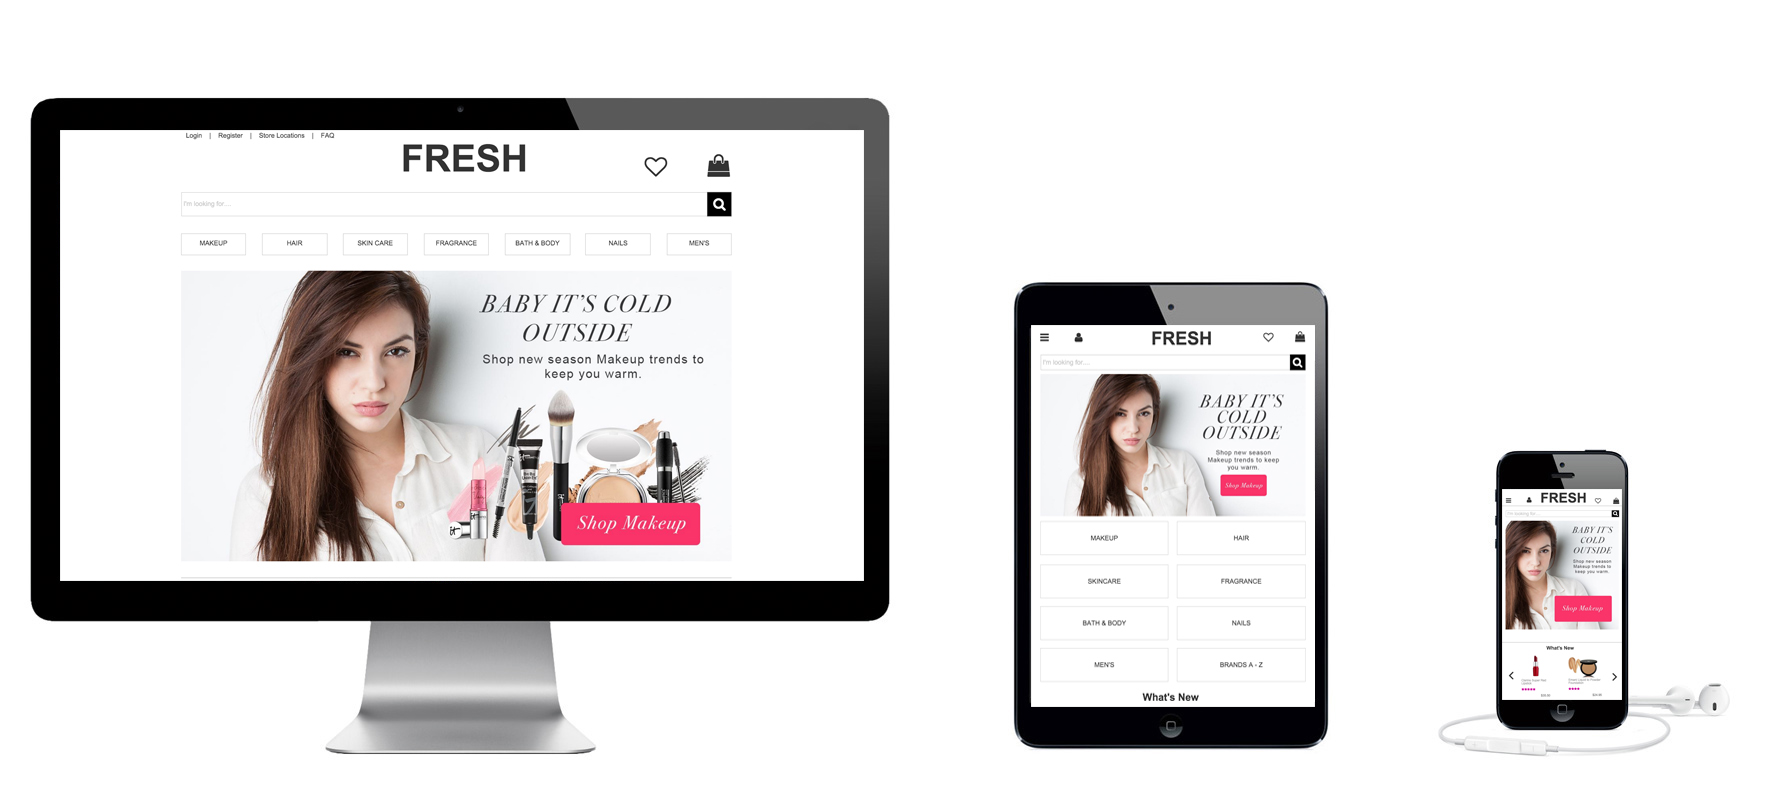 Fresh – Responsive Web Site